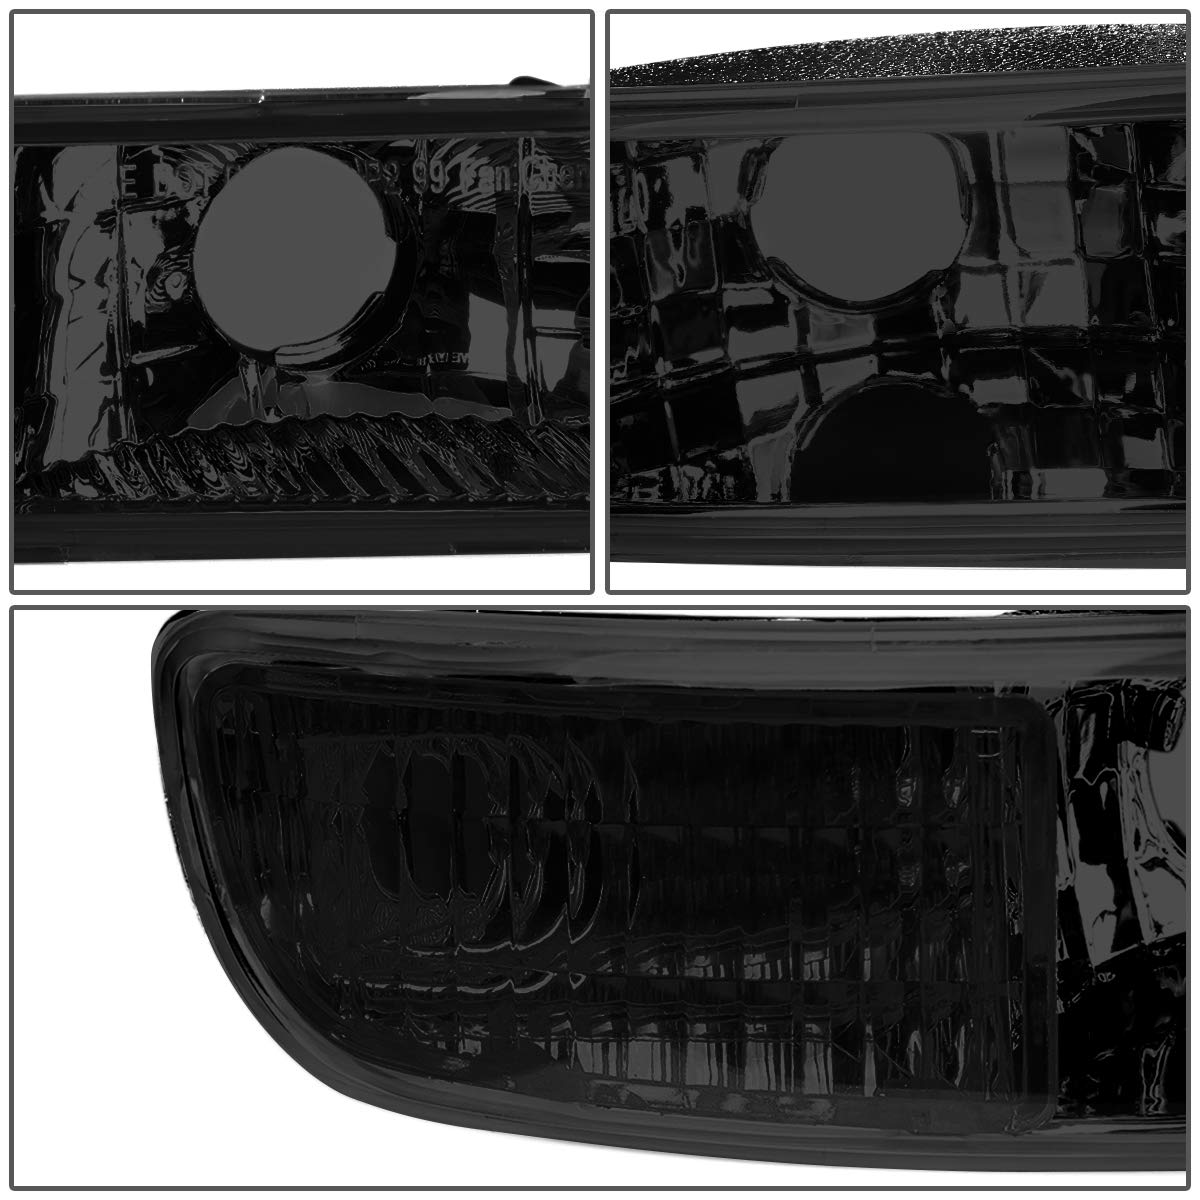 DNA Motoring HL-LB2-SIERRA99-SM-CL1 LED DRL Front Driving Headlight+Turn Signal Bumper Lamps Upgrade